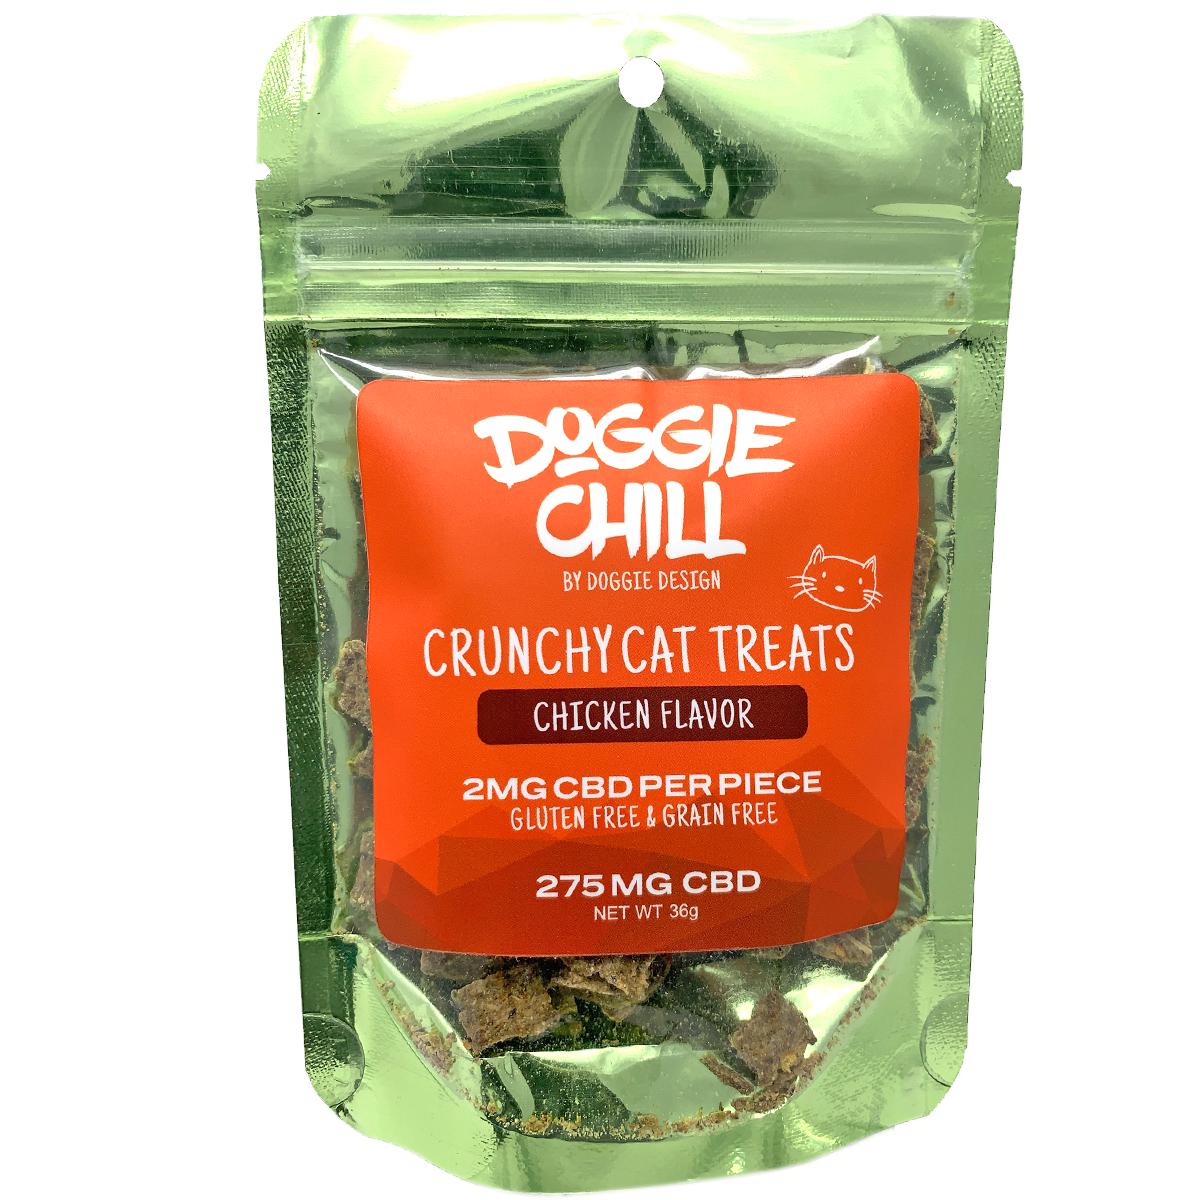 Doggie Chill Grain-Free CBD Crunchy Cat Treats - Chicken